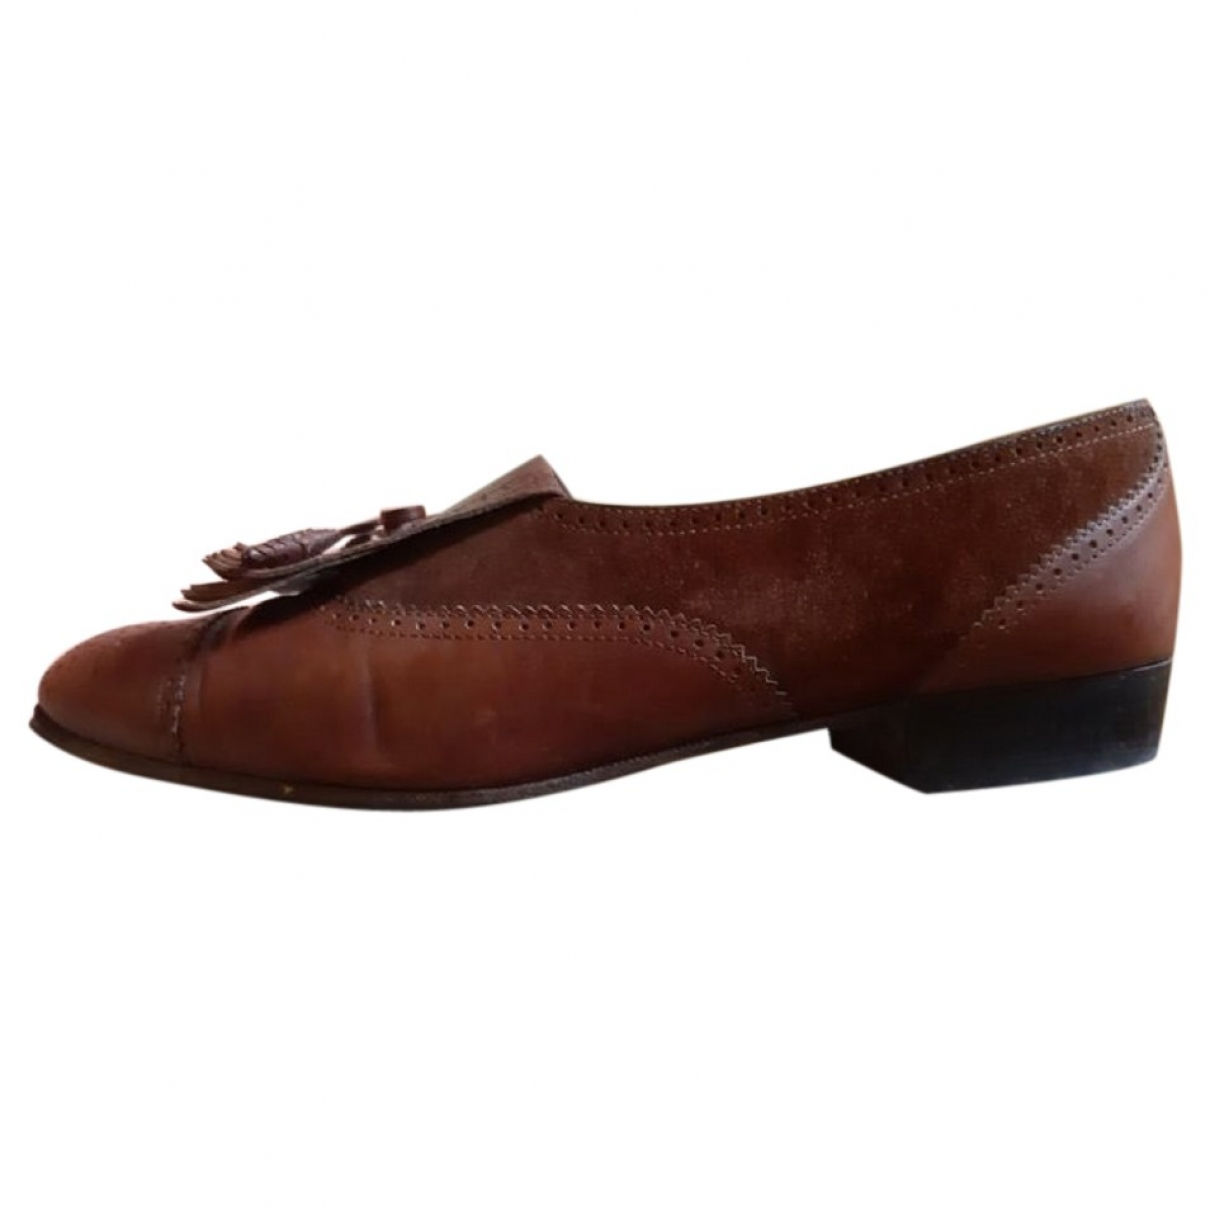 Salvatore Ferragamo \N Brown Leather Flats for Women 39 EU